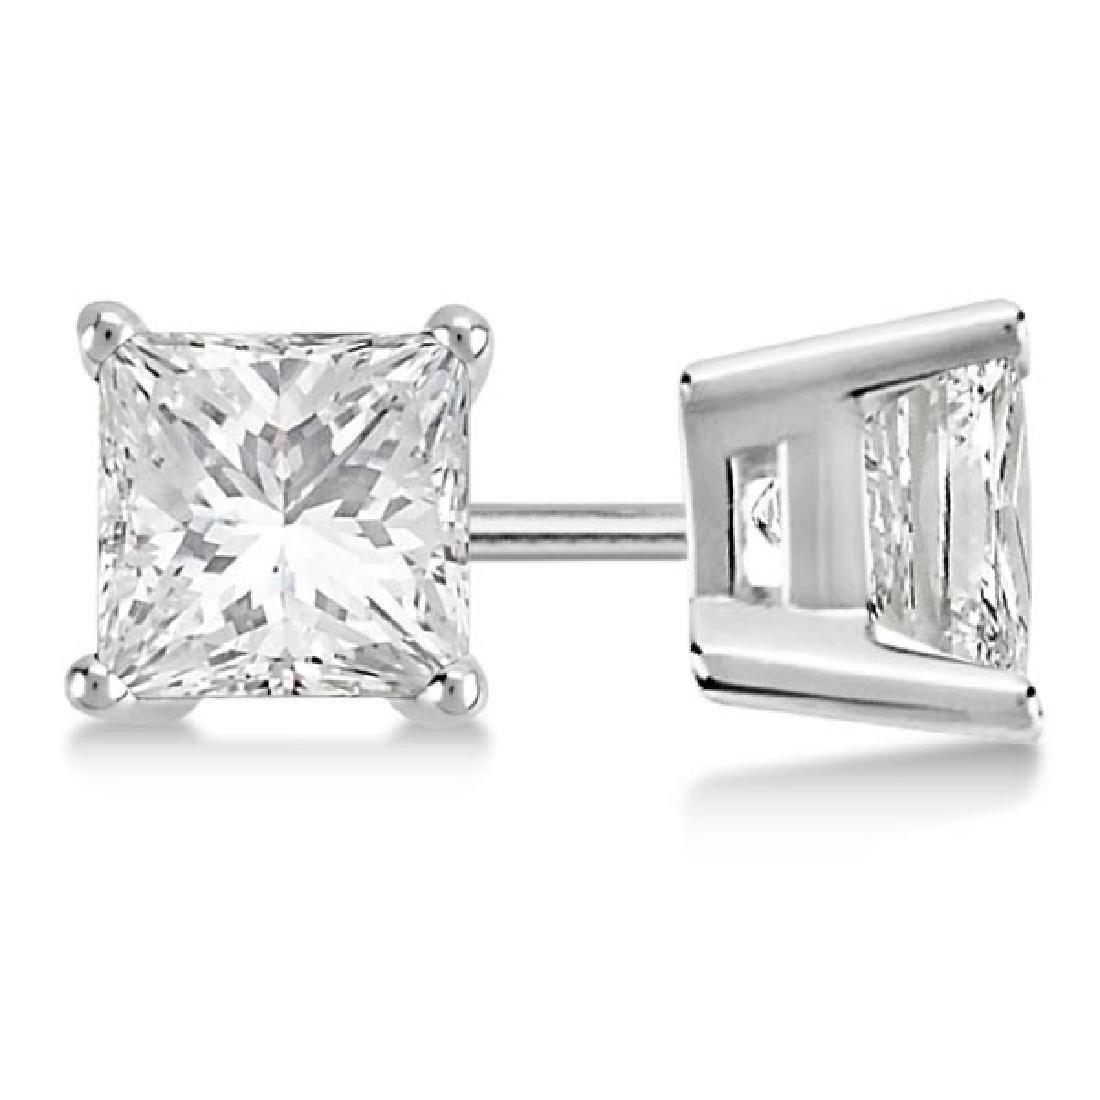 Certified 1.01 CTW Princess Diamond Stud Earrings E/SI2